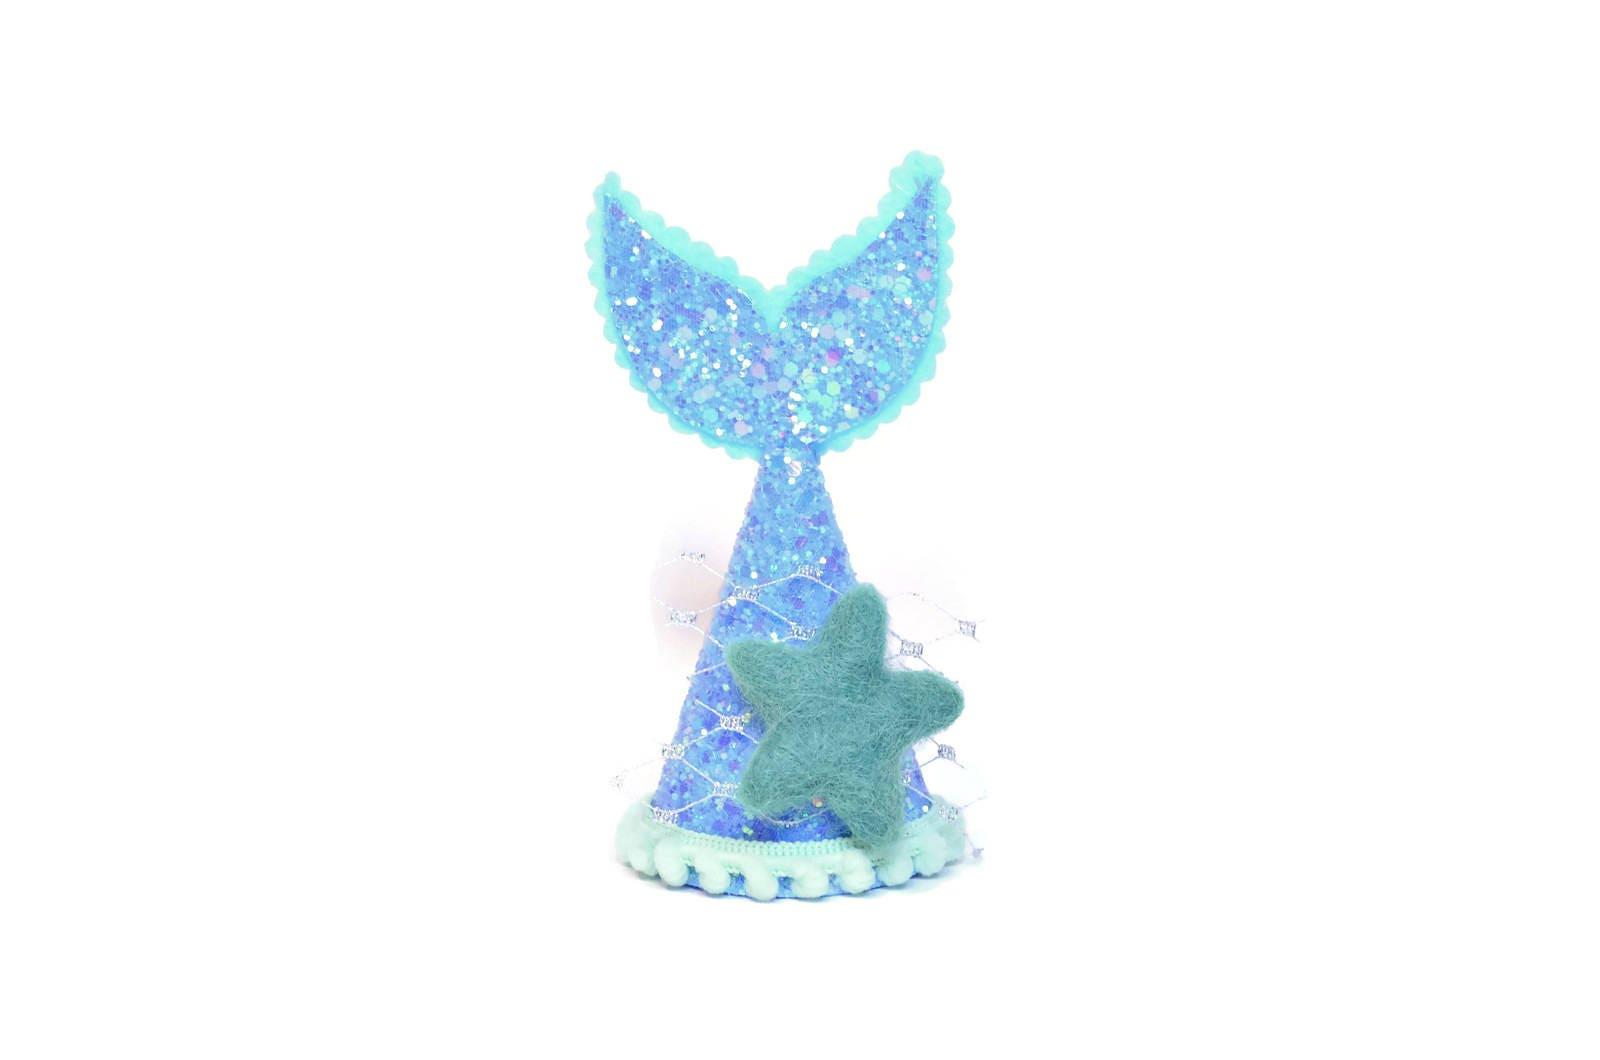 Blau und Minze Glitzer Meerjungfrau Partyhut Meerjungfrau